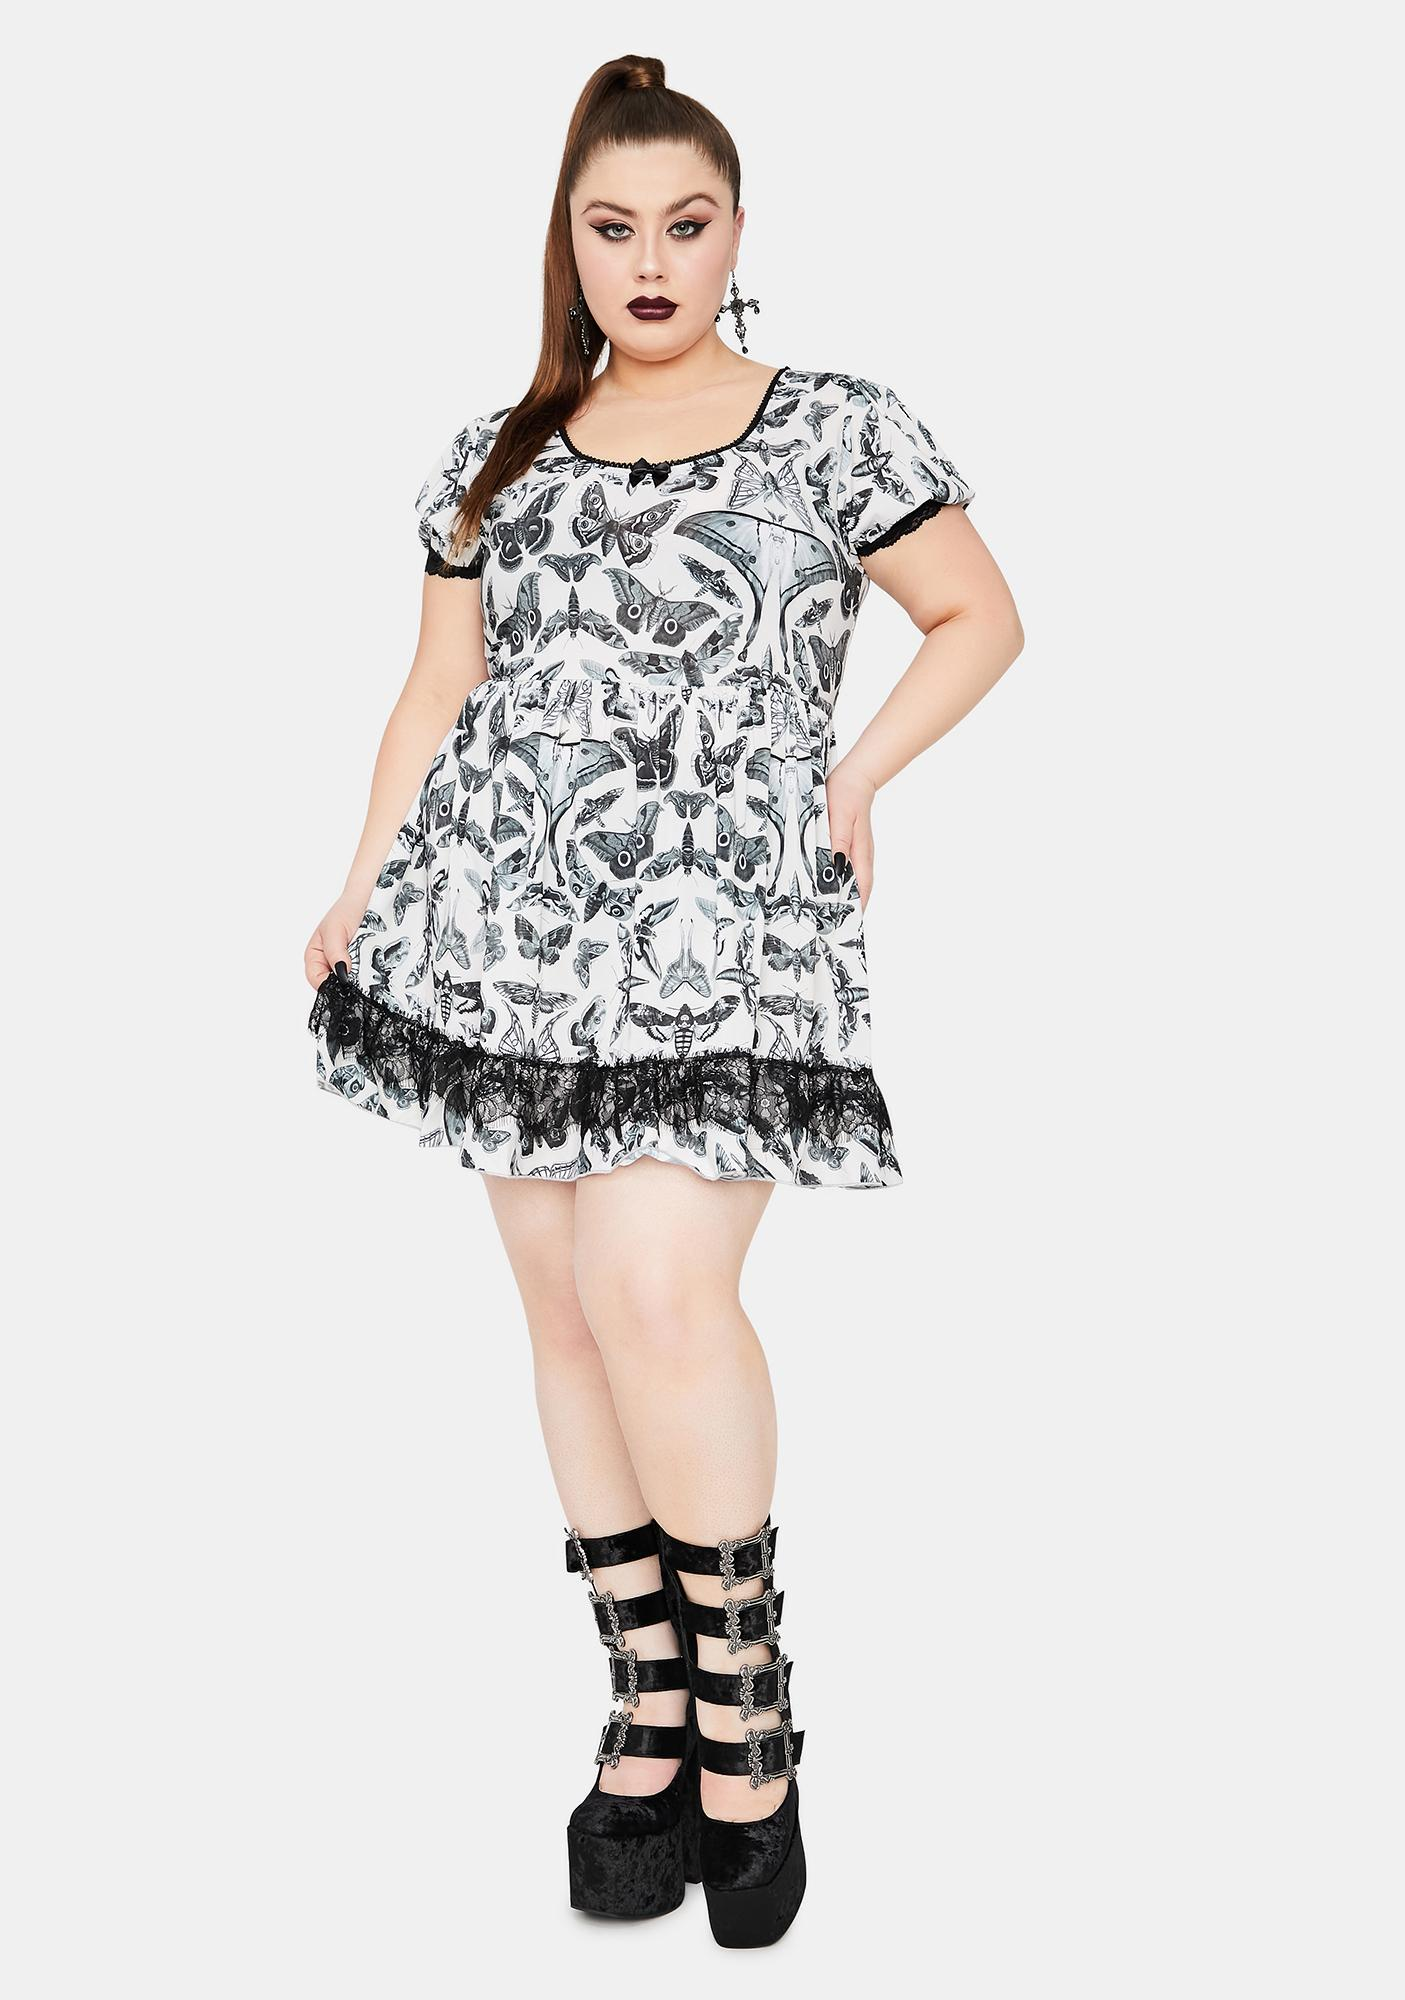 Widow Divine Spirit World Lace Trim Moth Print Dress